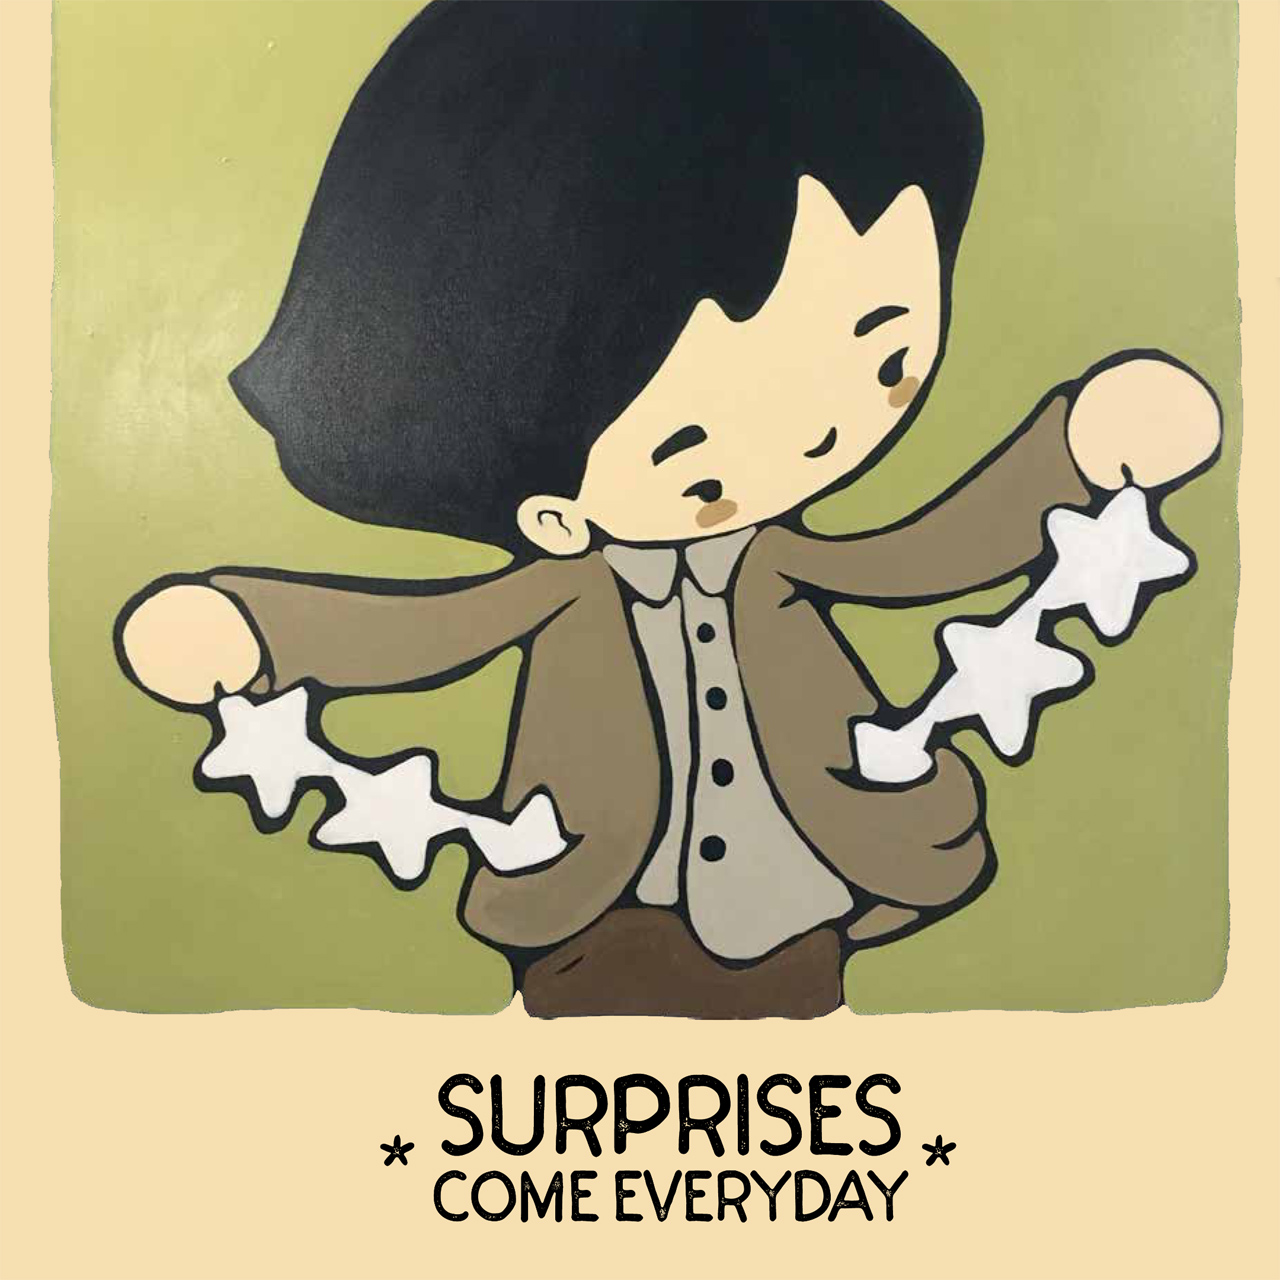 ale puro surprises